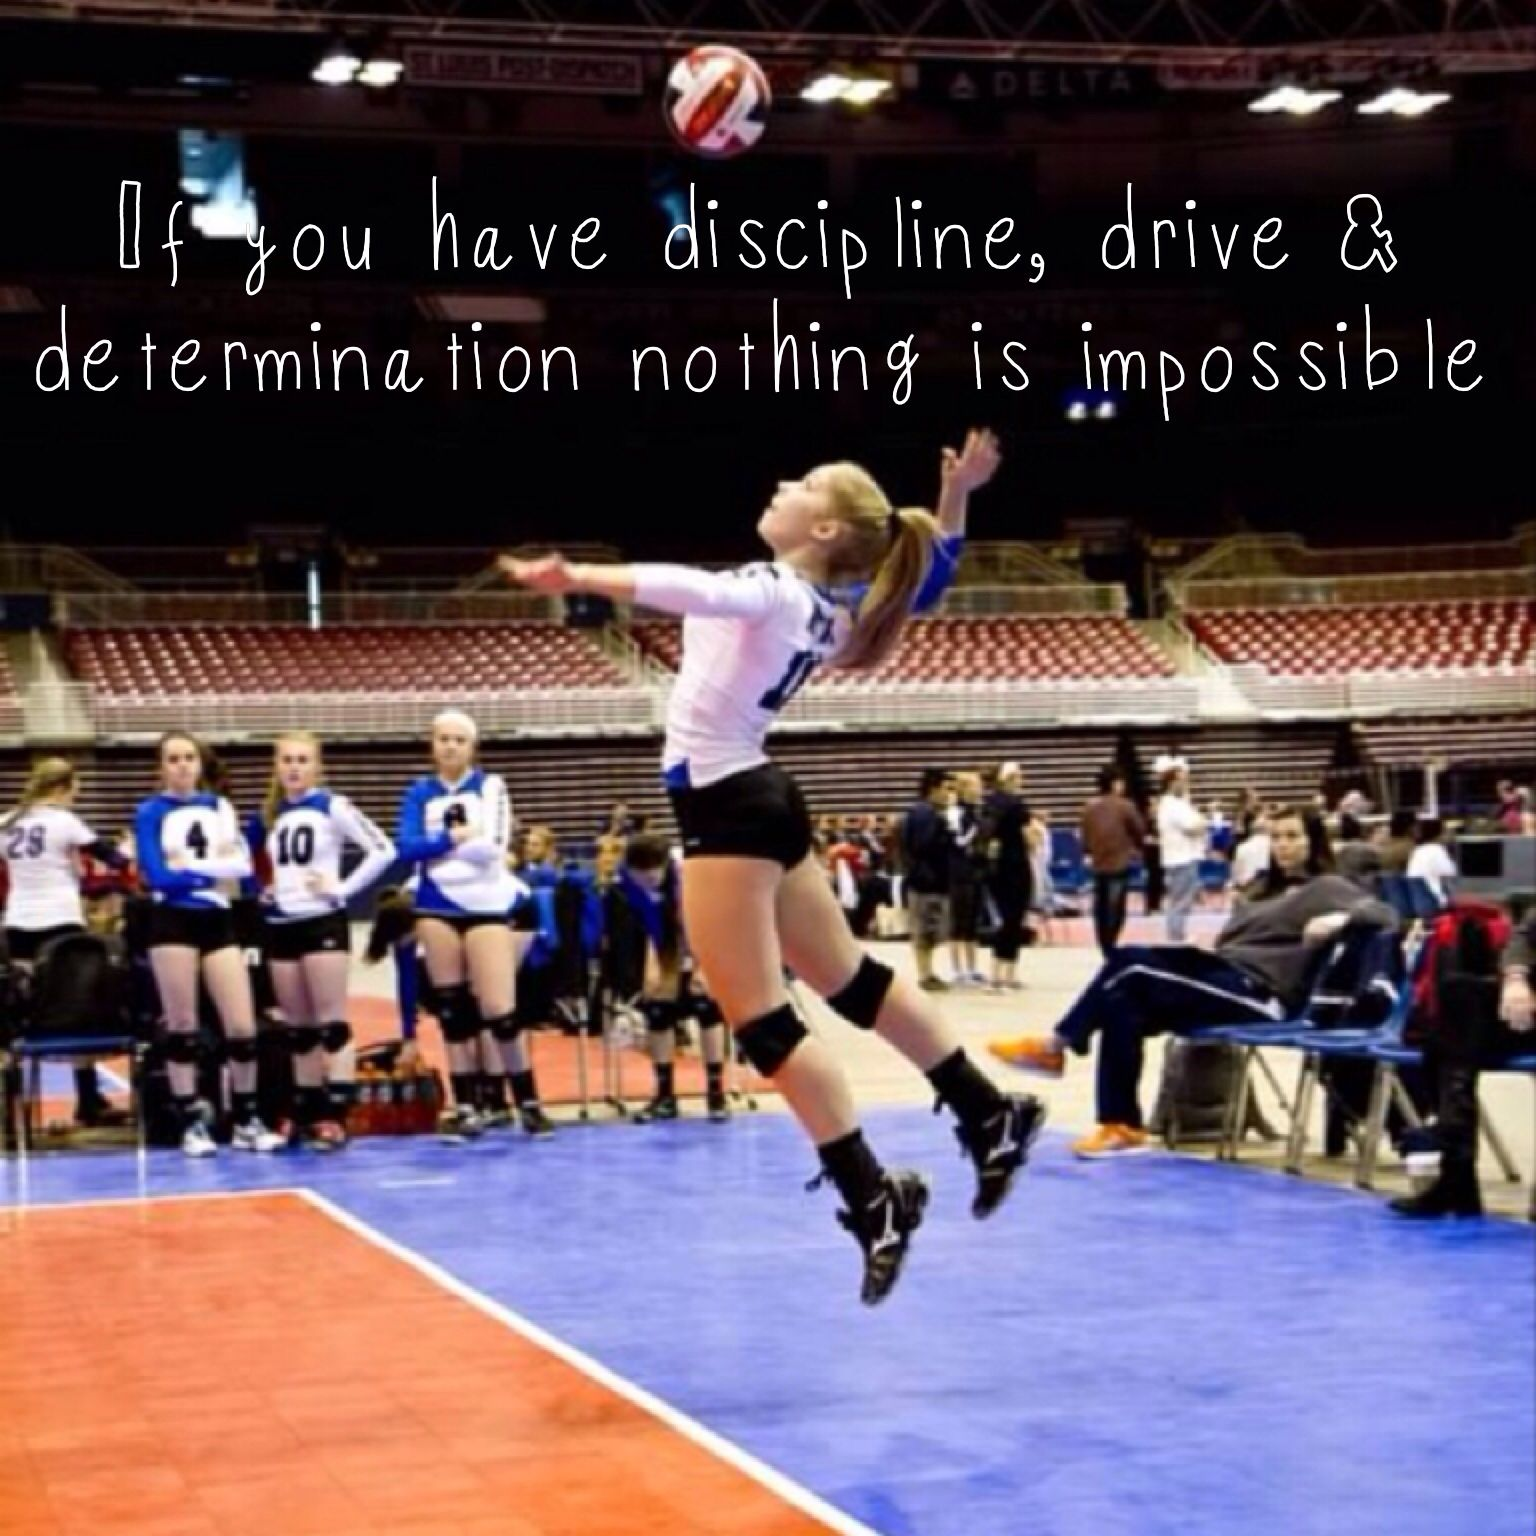 Discipline Drive Determination Volleyball Mybaby Voley Ropa Deportiva Mujer Deportes